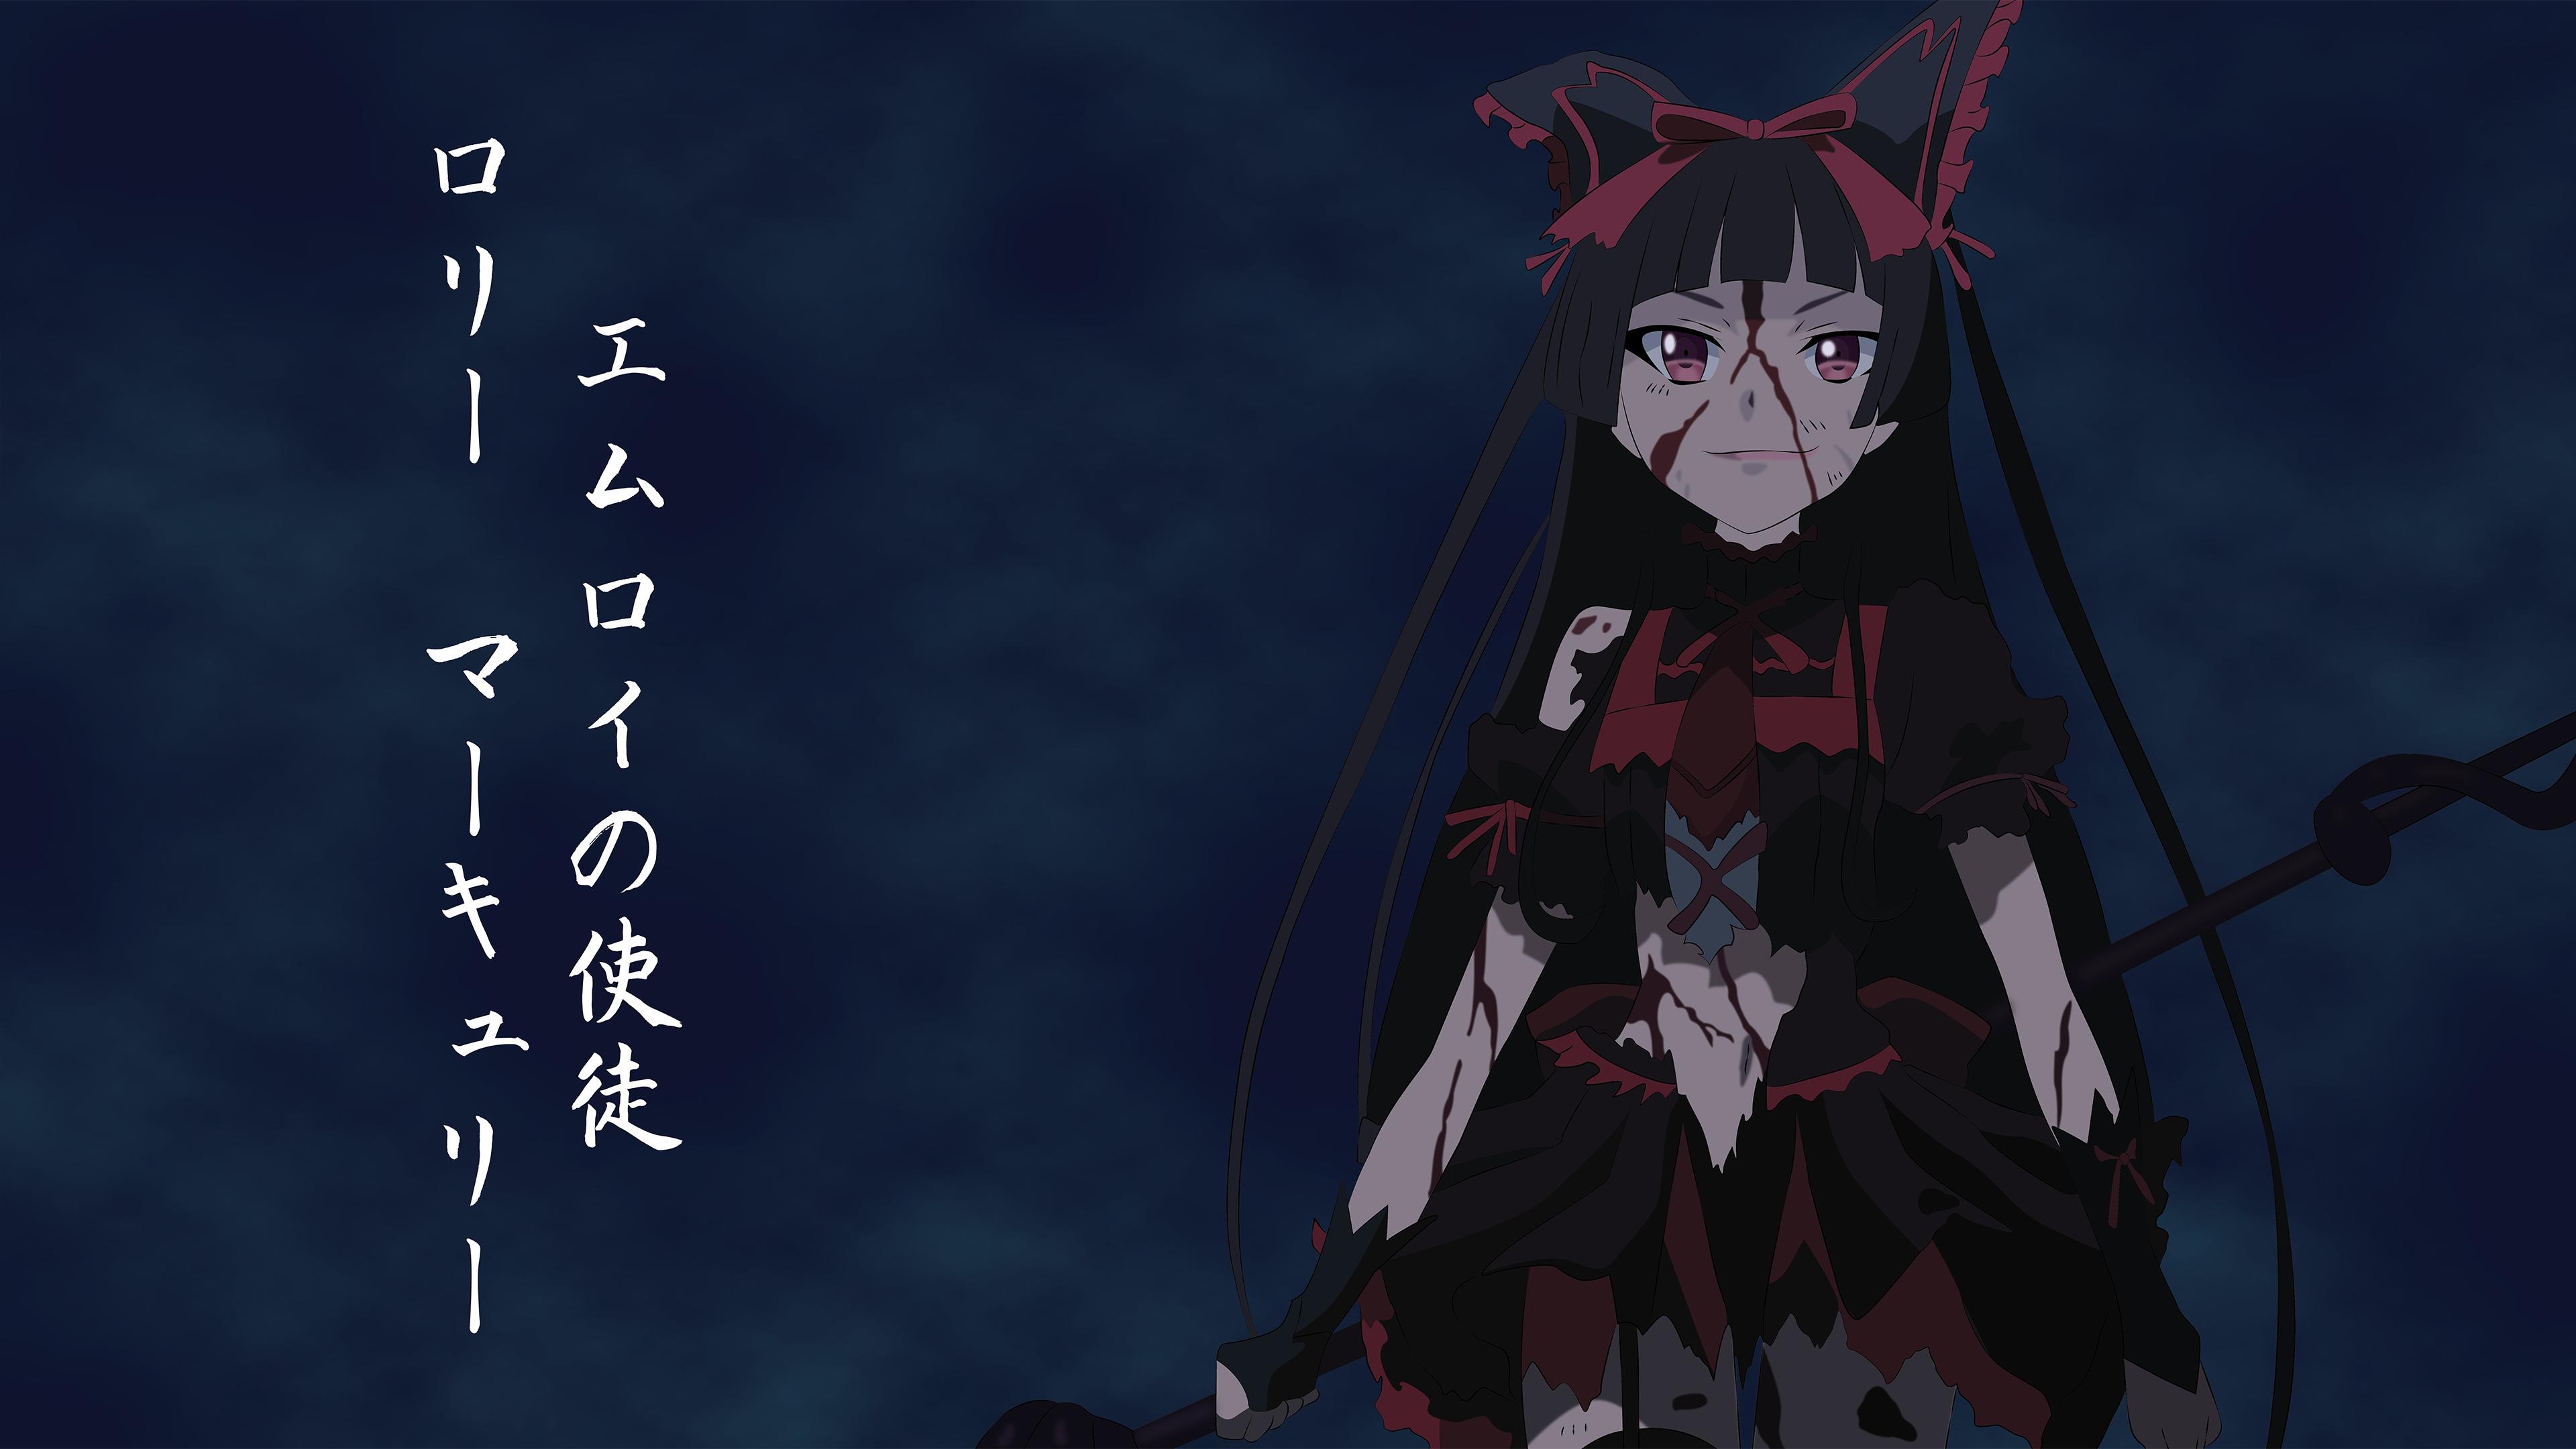 Anime Gate Jieitai Kanochi Nite, Kaku Tatakaeri Rory